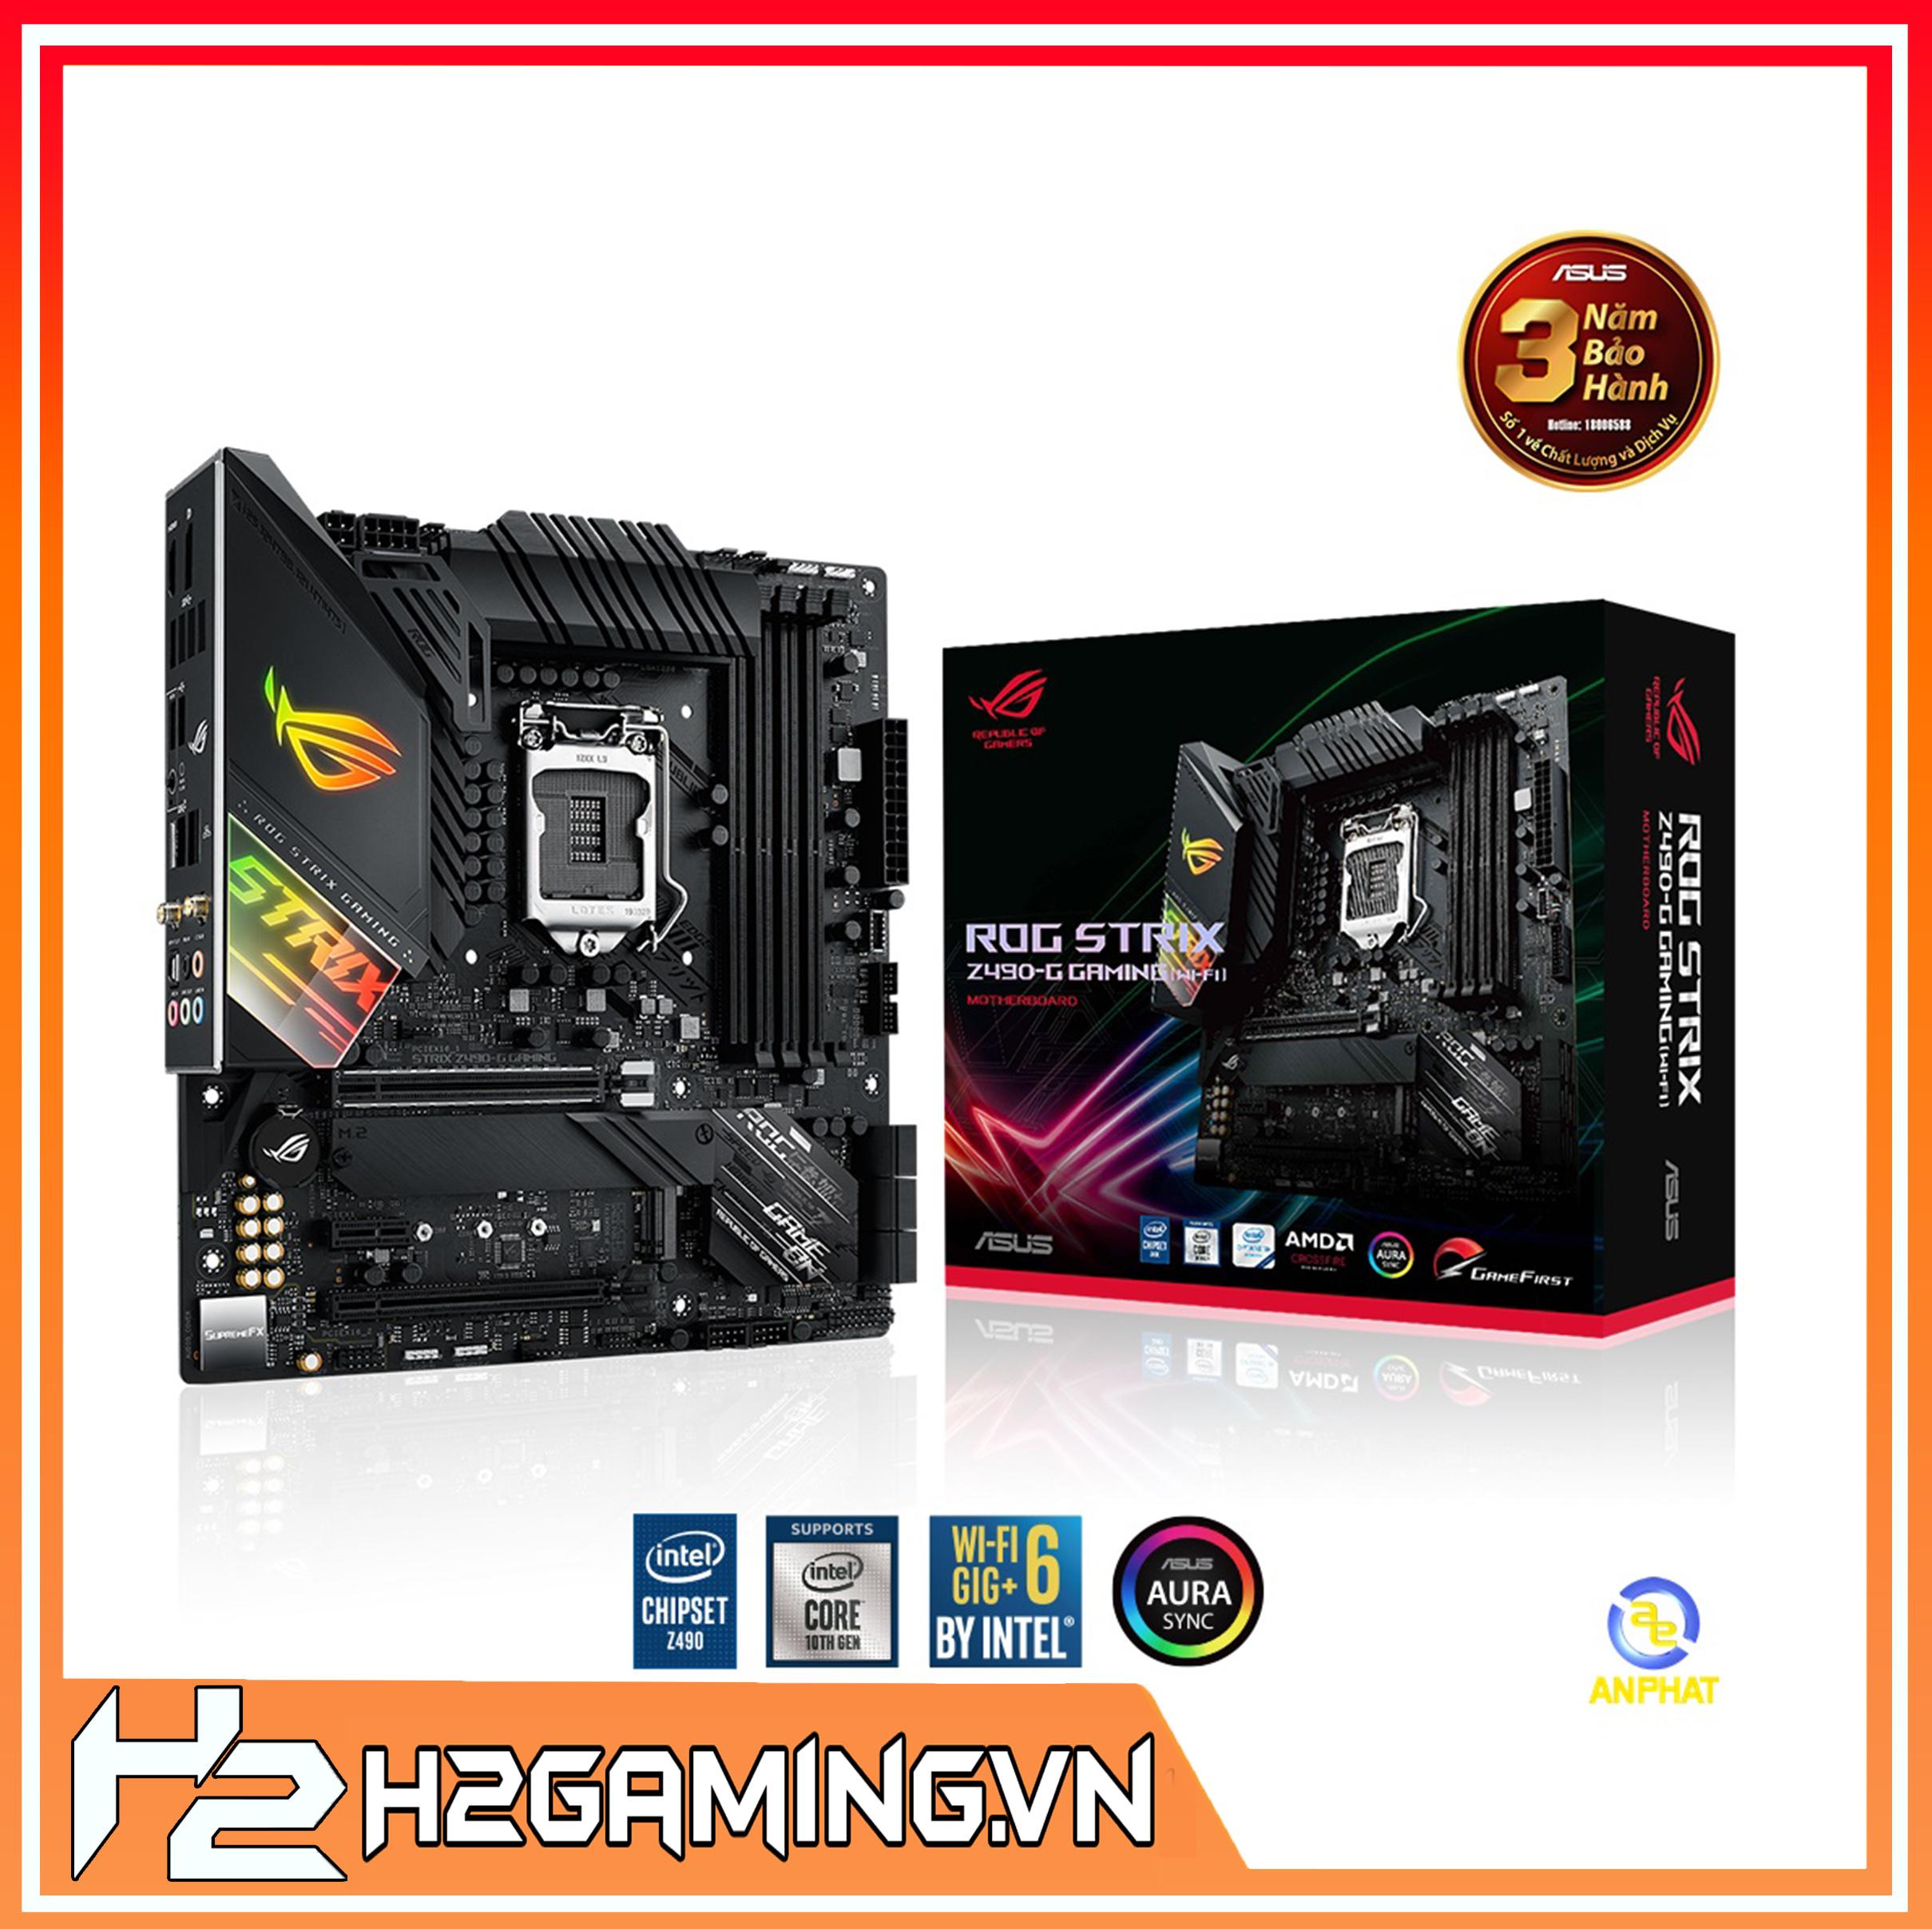 ROG_Strix_Z490-G_Gaming_(WI-FI)_3